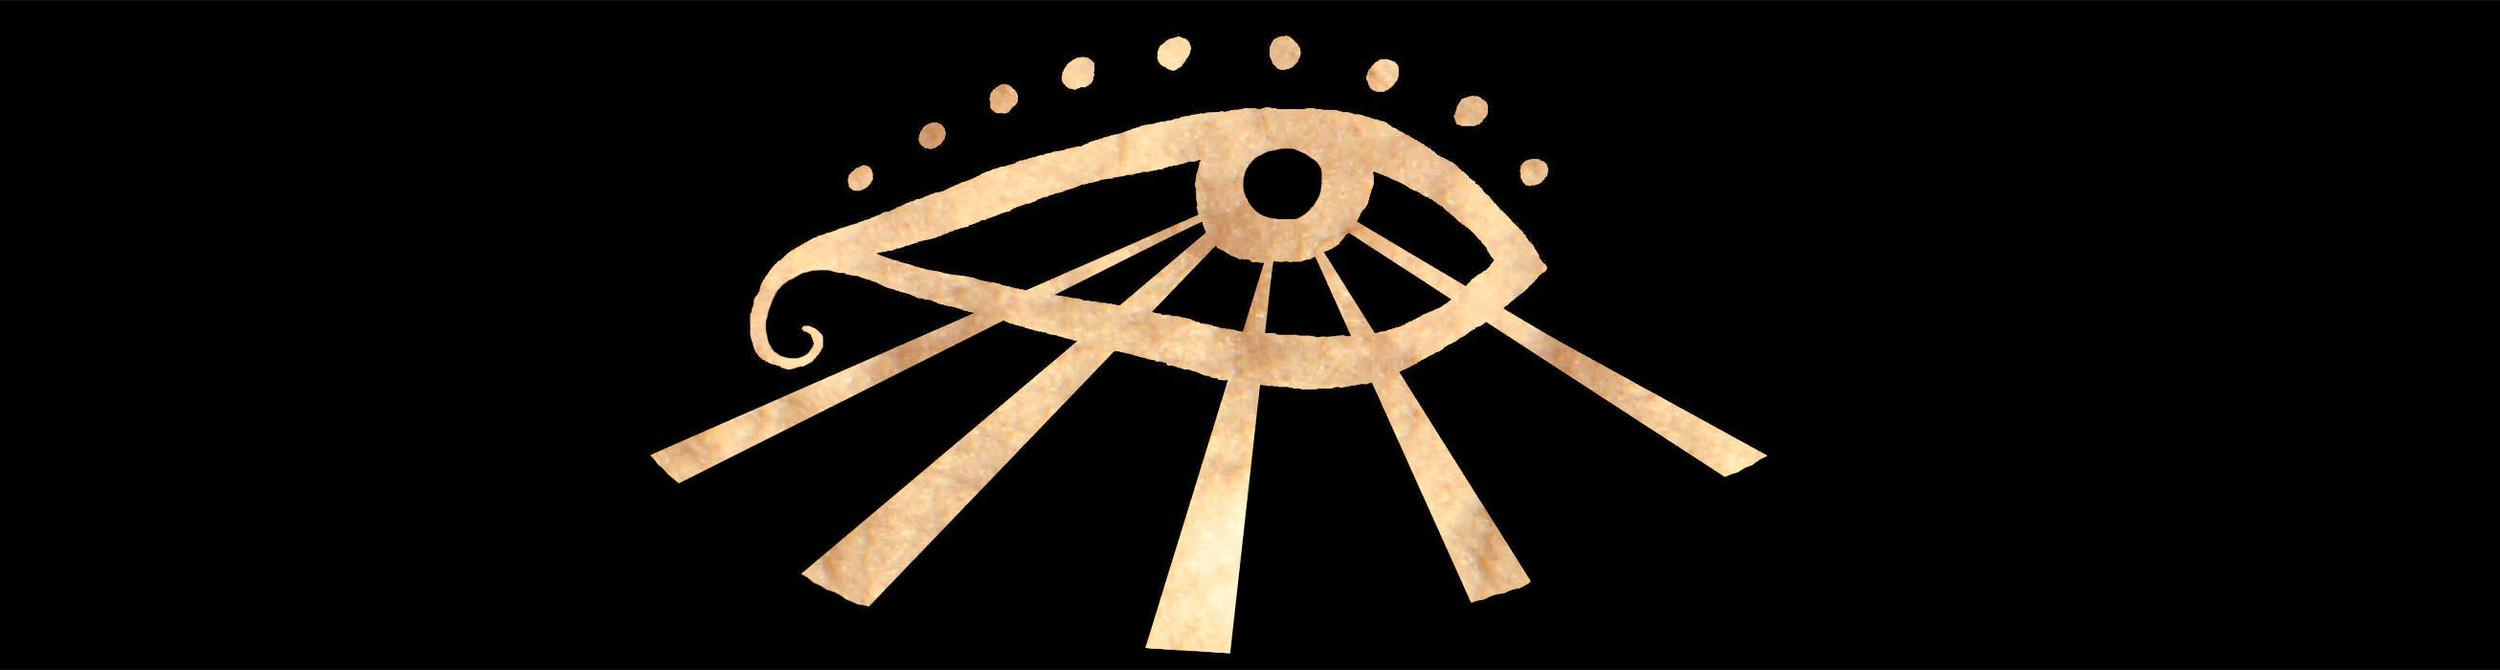 eye iconz7.jpg